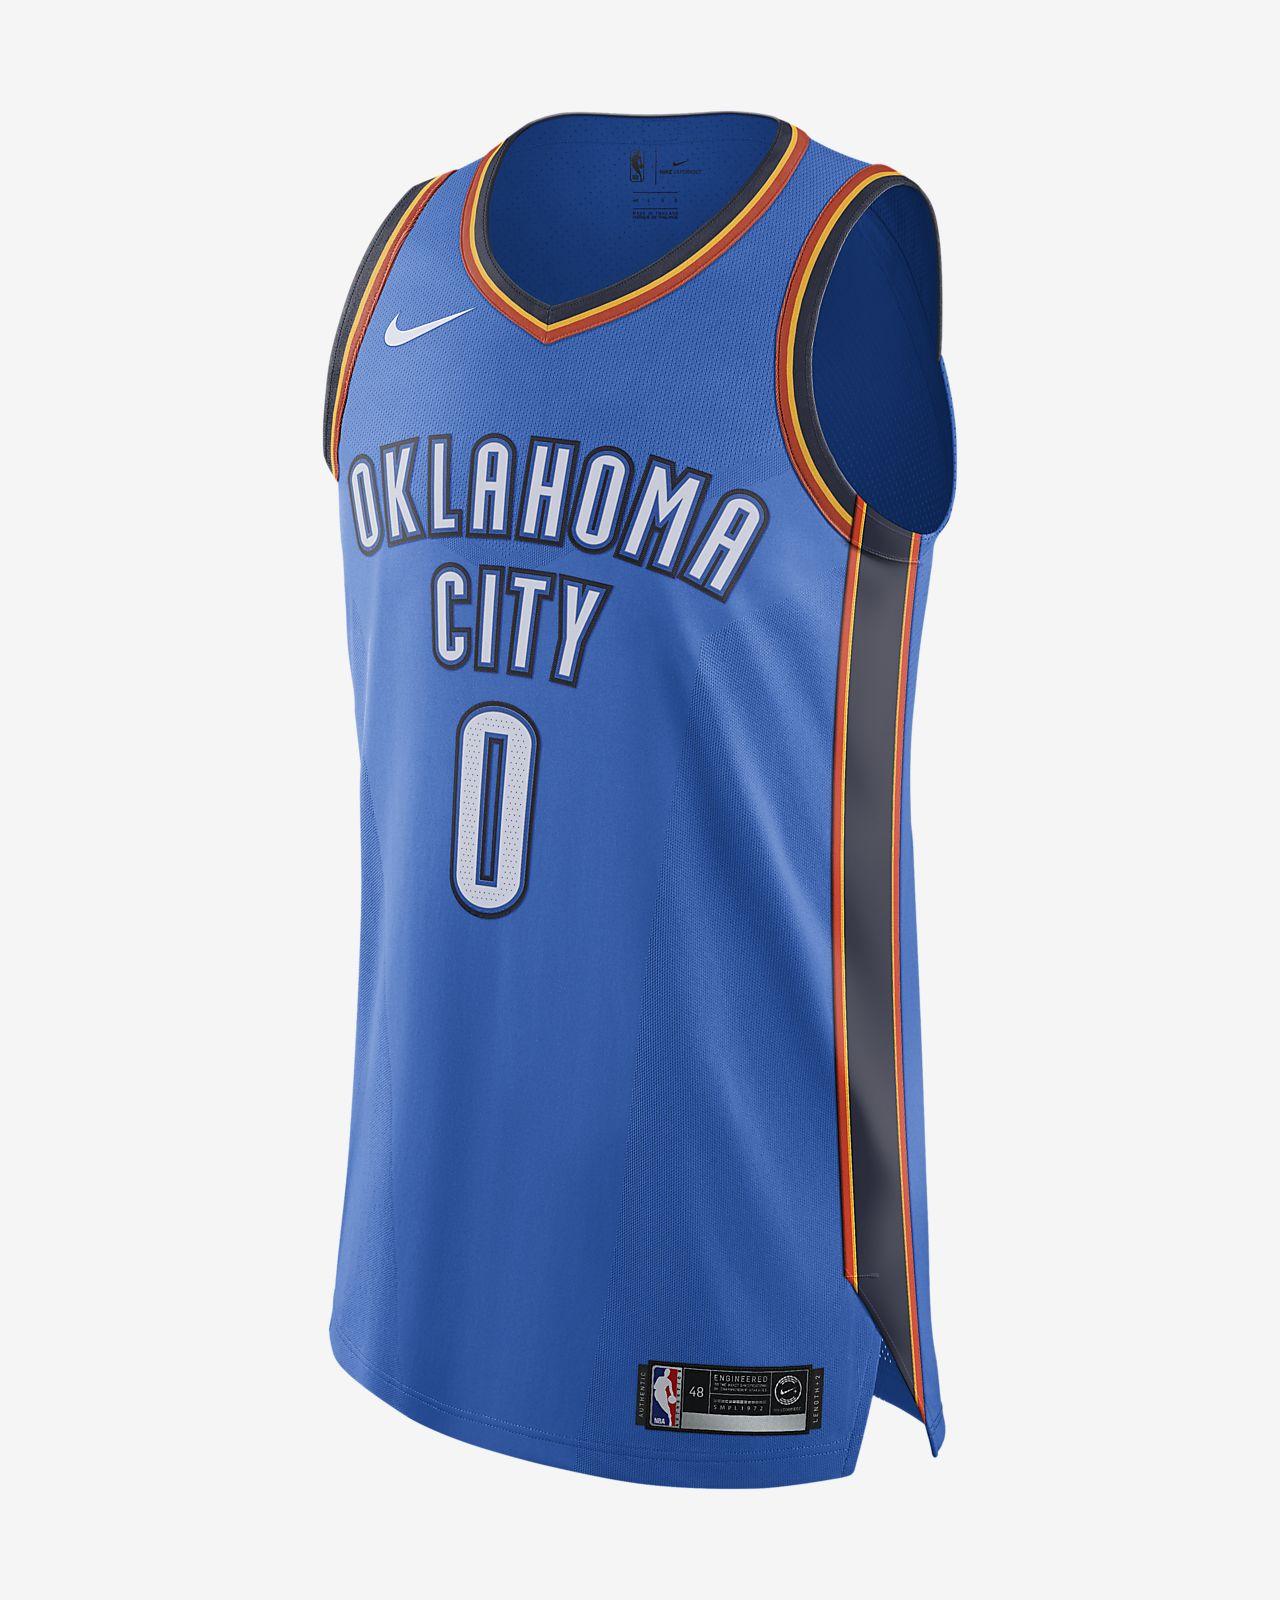 Мужское джерси Nike НБА Russell Westbrook Icon Edition Authentic (Oklahoma City Thunder) с технологией NikeConnect